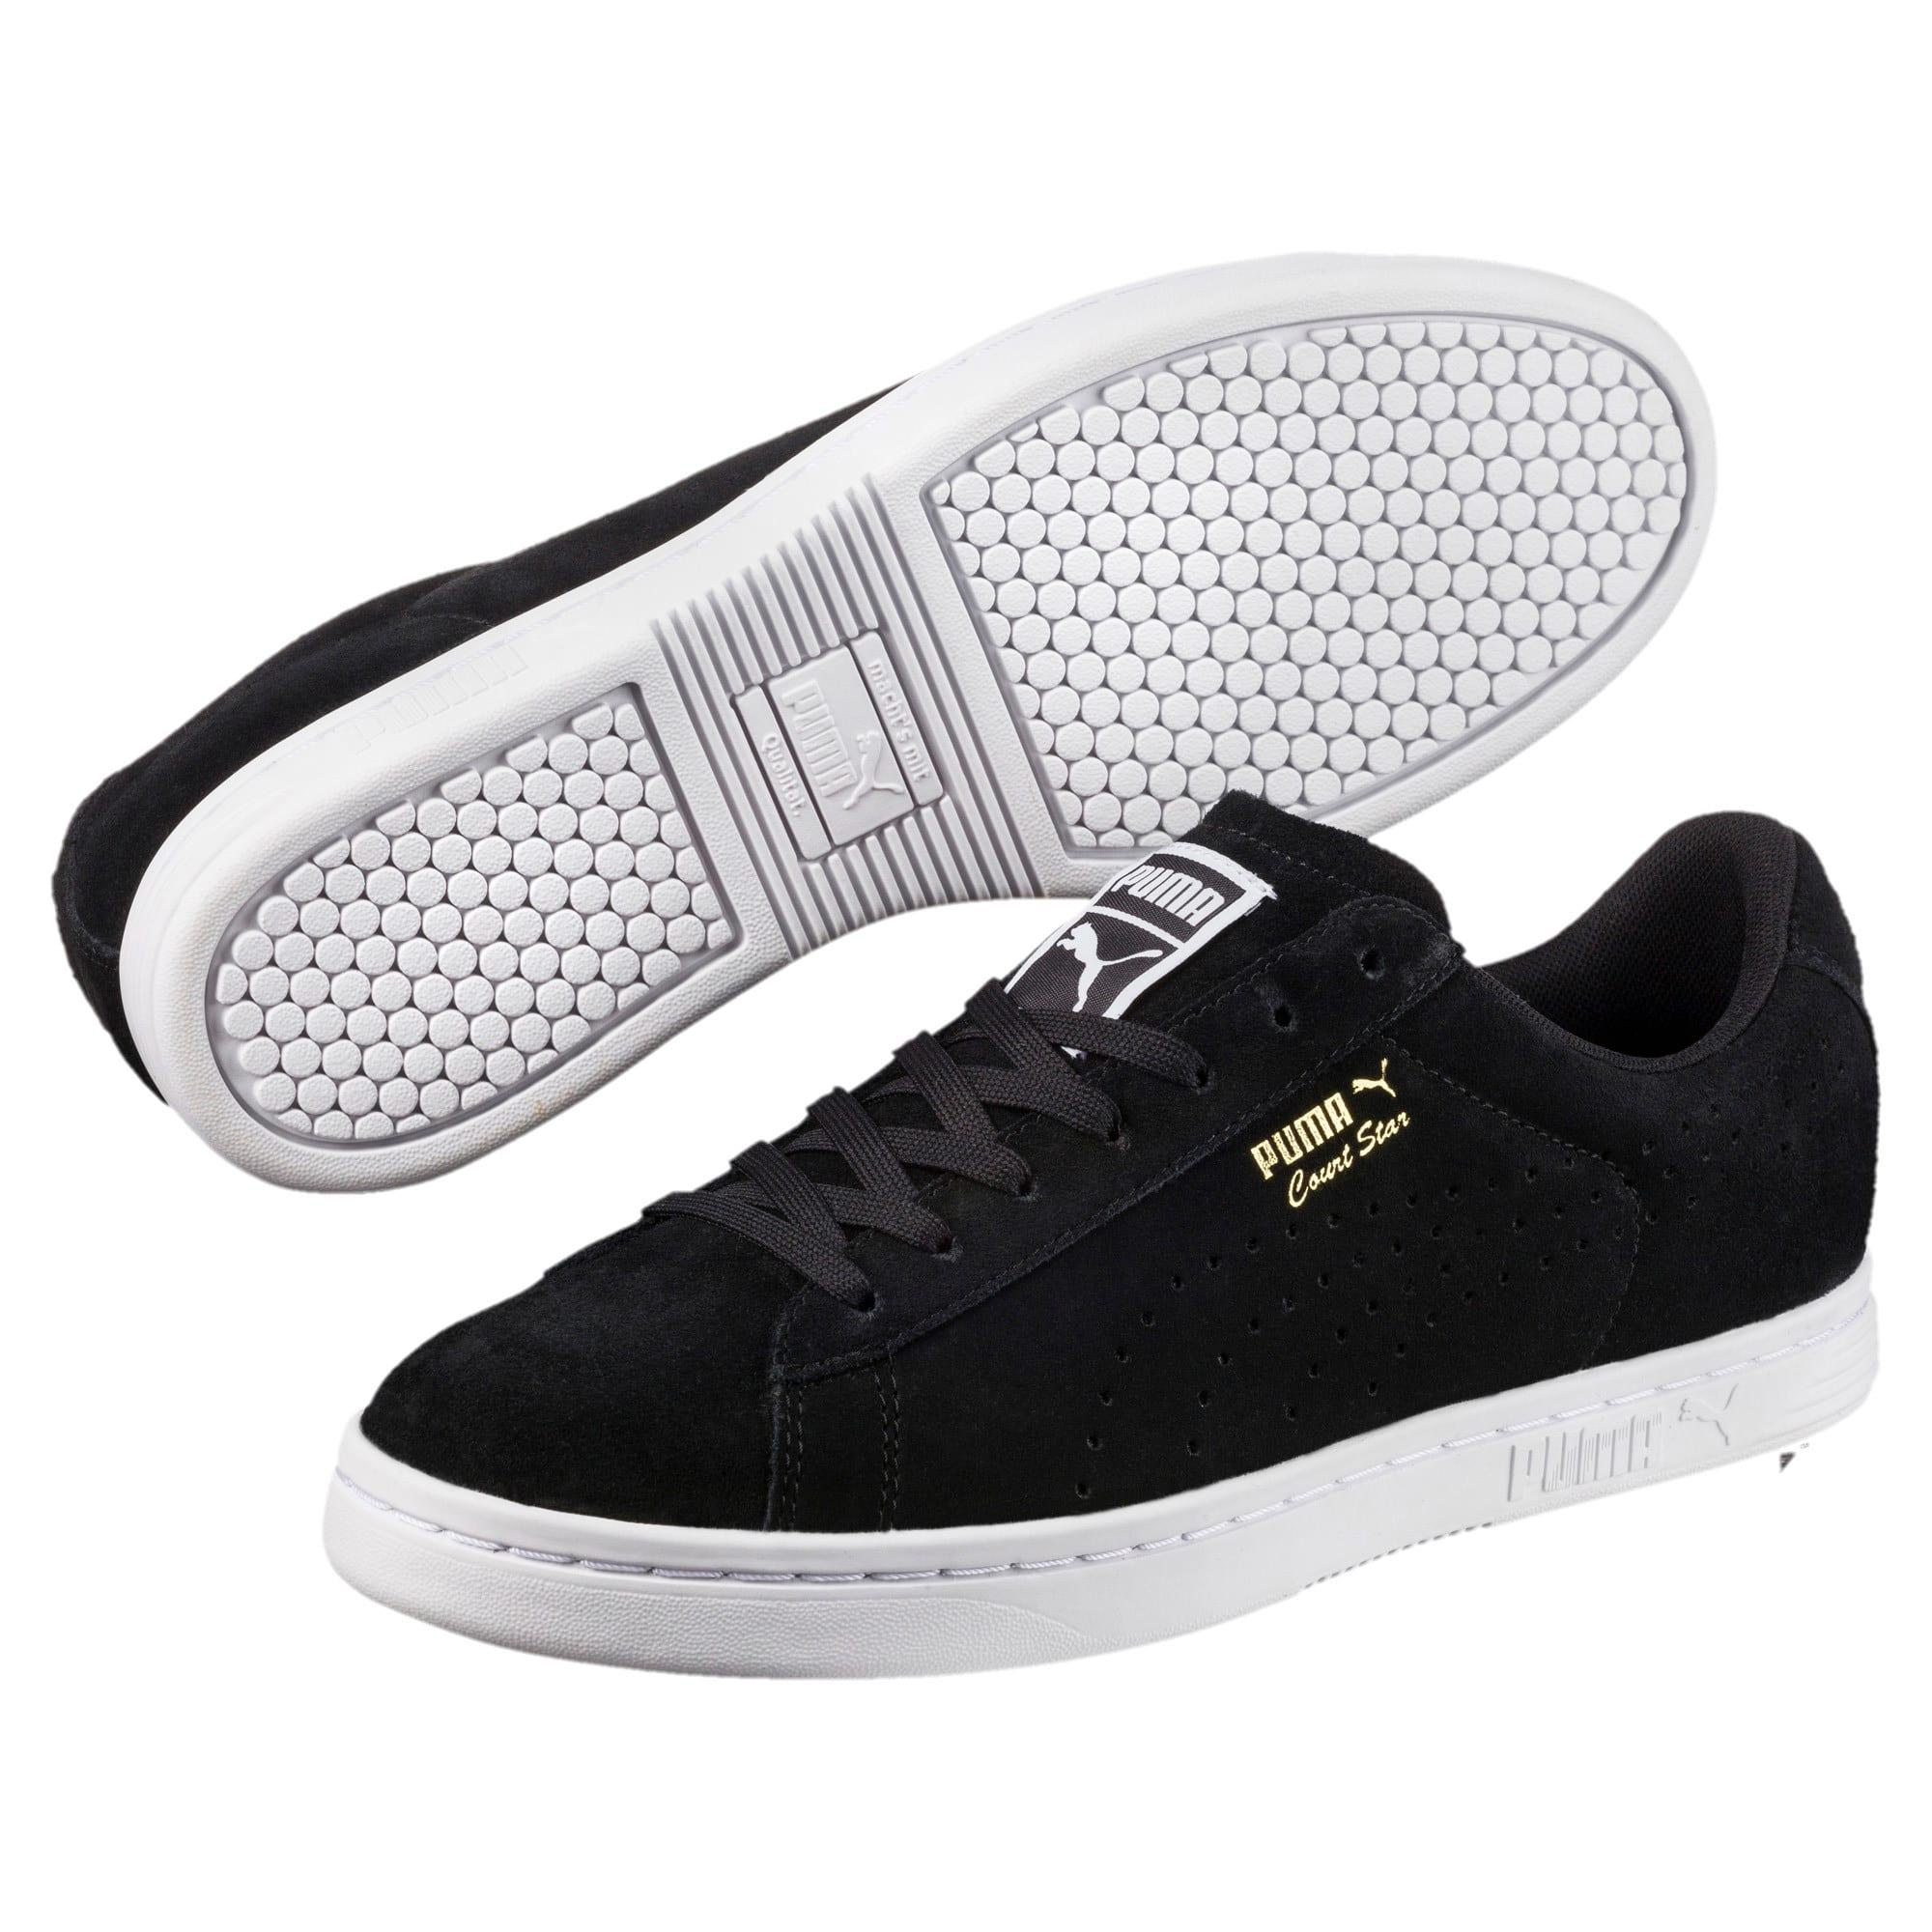 Thumbnail 2 of Court Star Suede Sneakers, Puma Black, medium